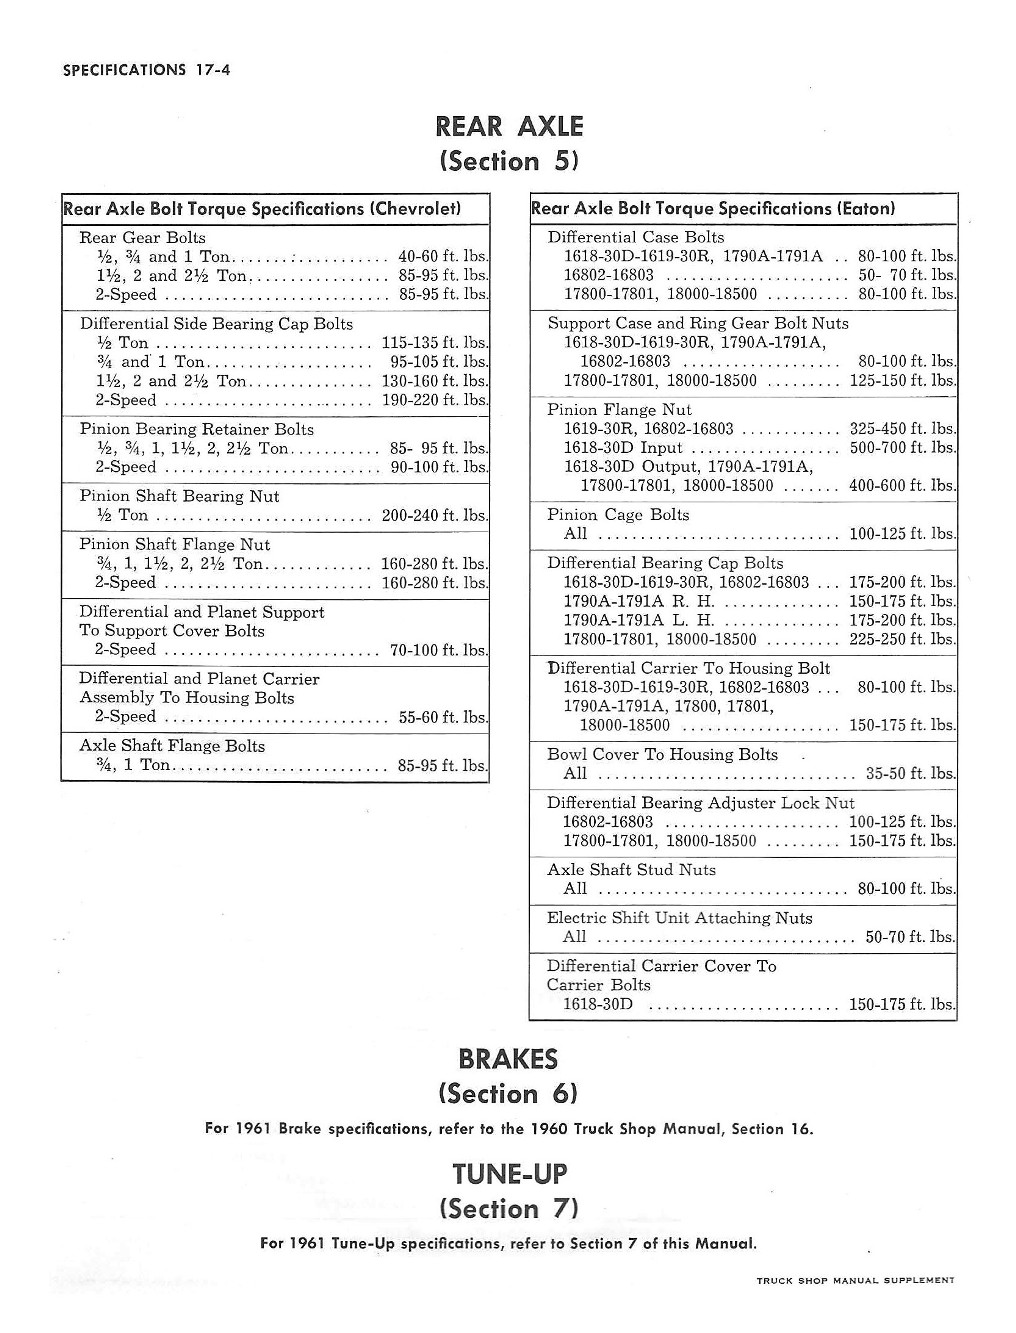 1961 Chevrolet Truck Shop Manual Supplement